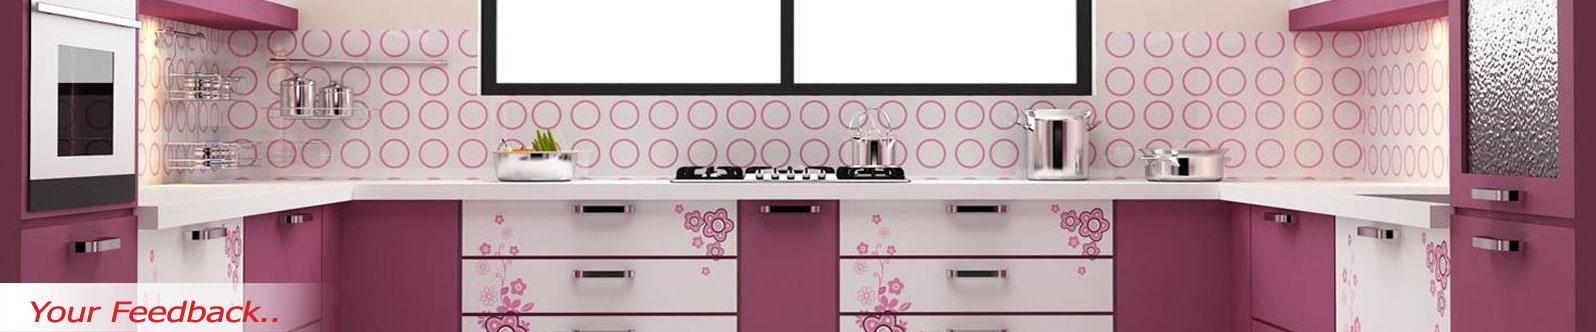 rasoi modular kitchen in raipur, luxury modular kitchens in raipur